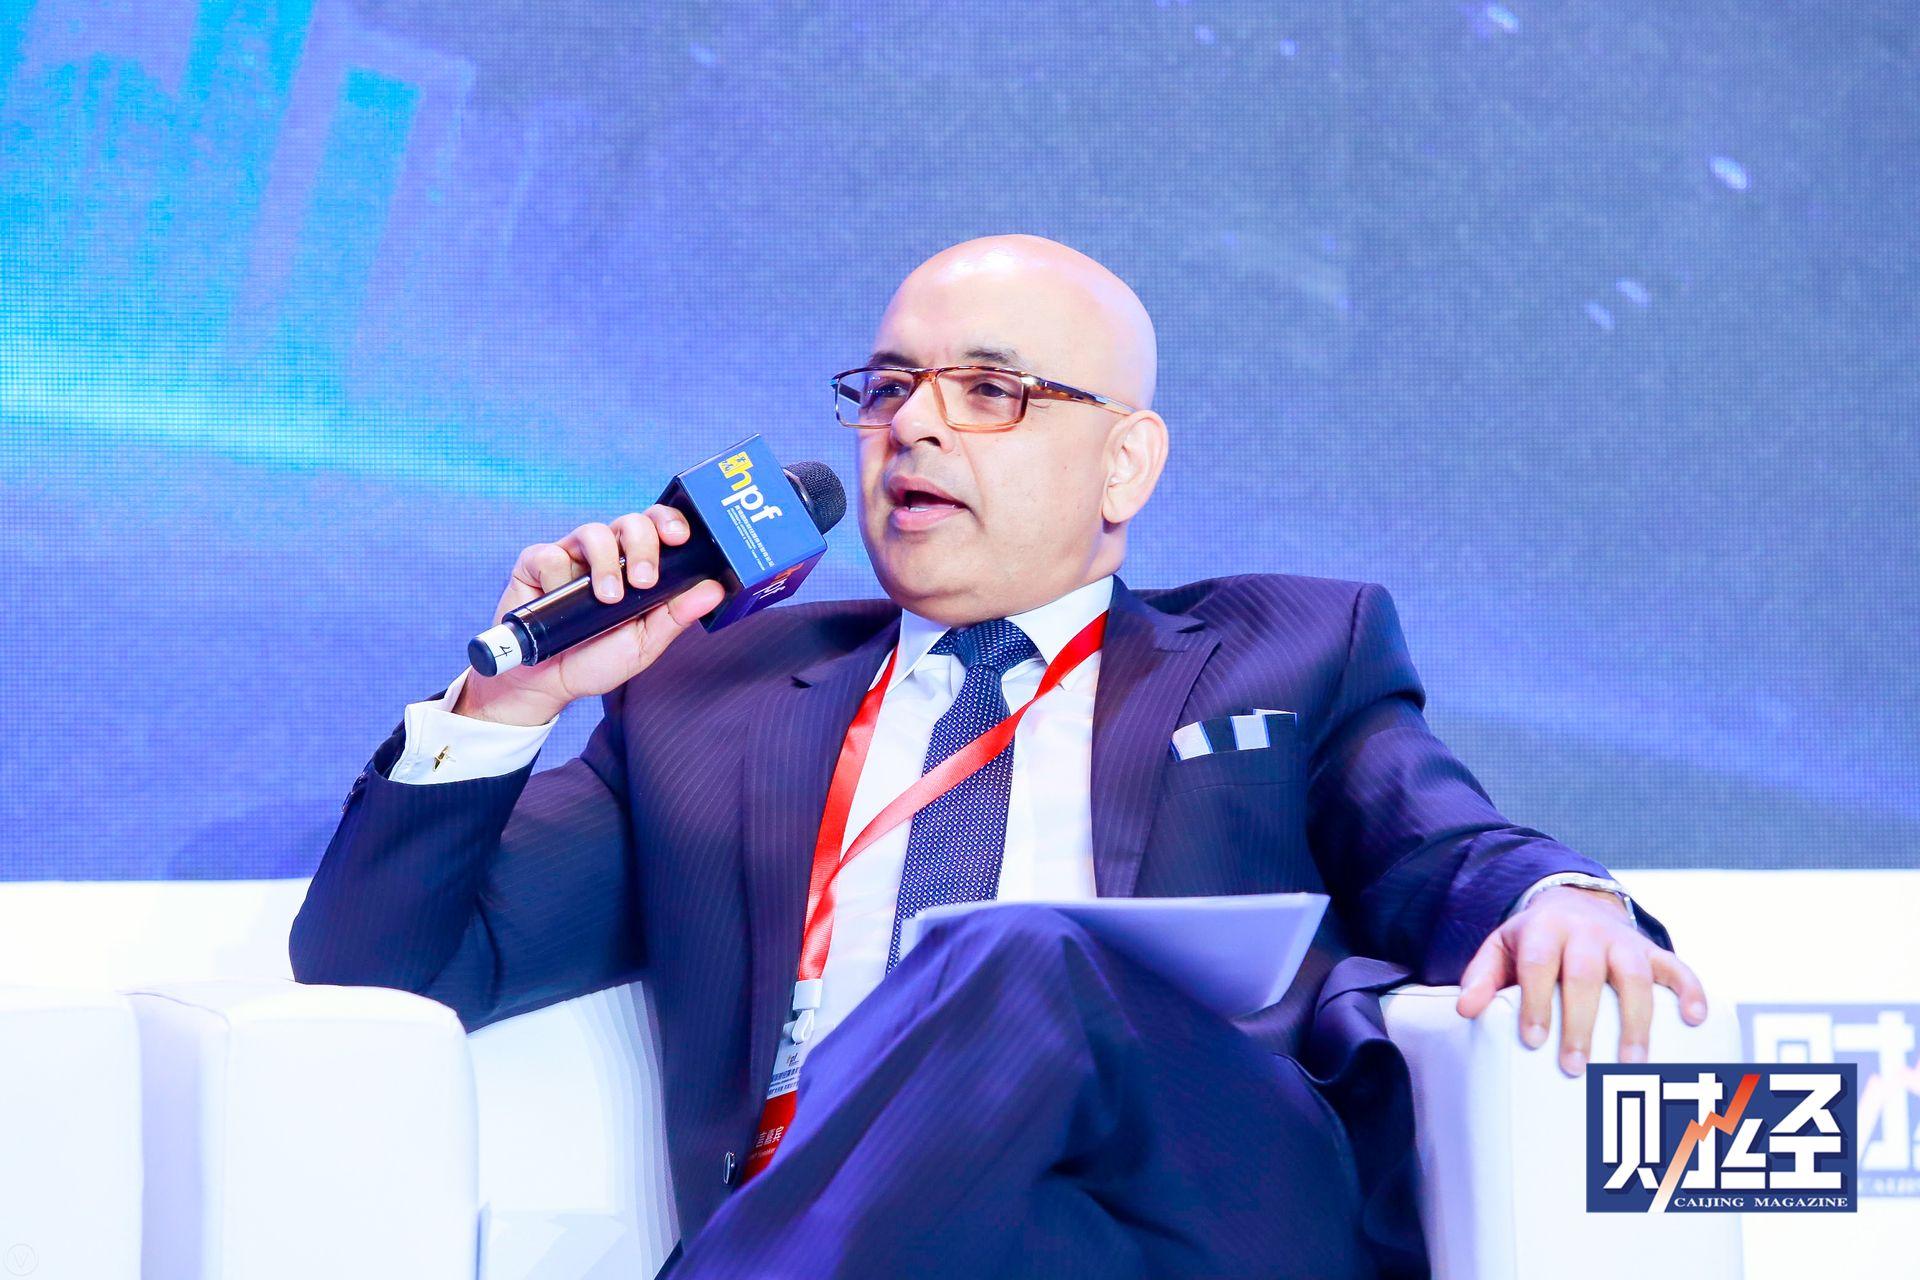 Atul DALAKOTI:中印要加强合作必须增强互信